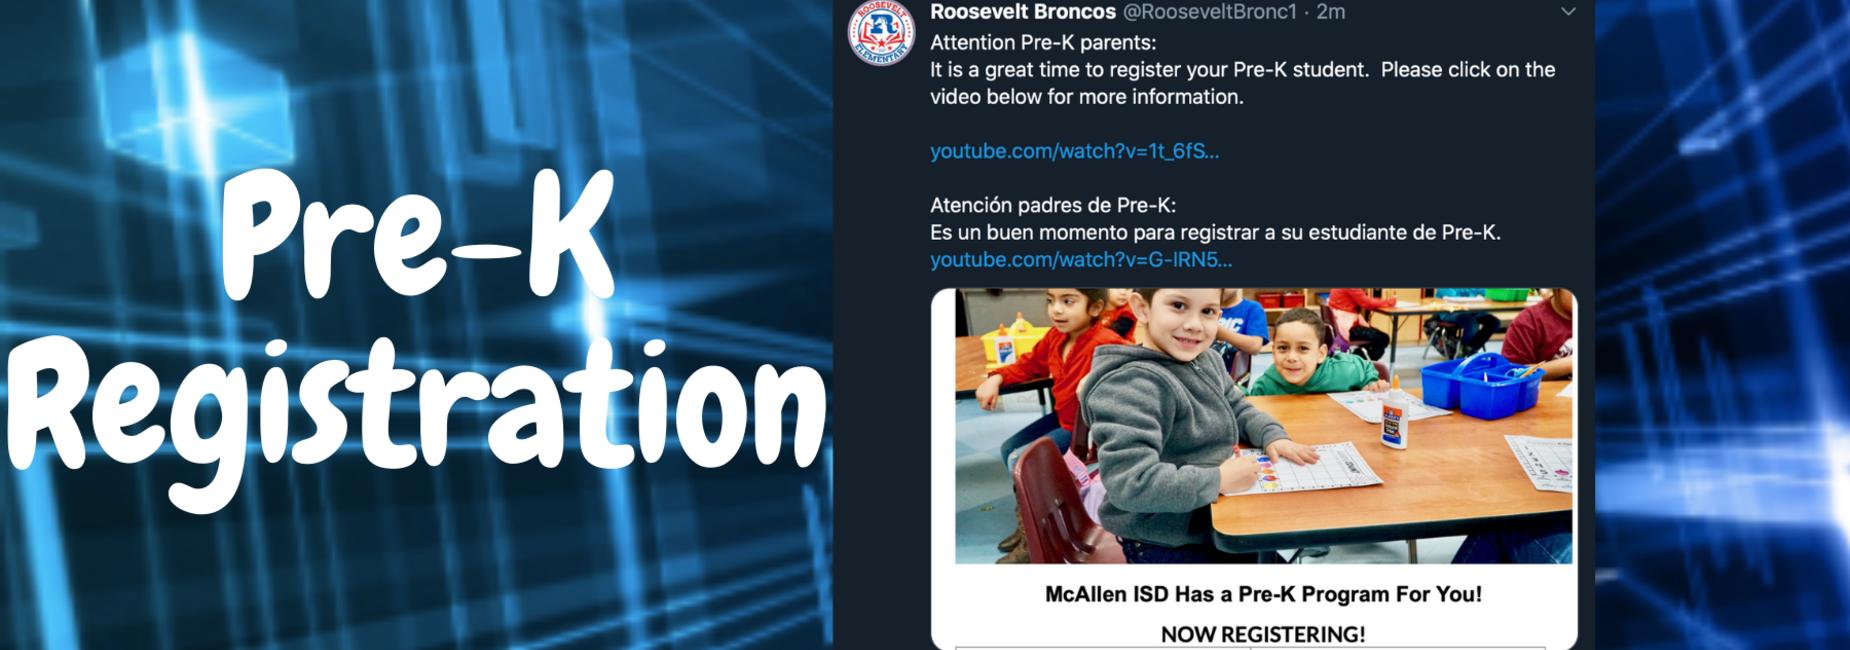 PreK Registration Information